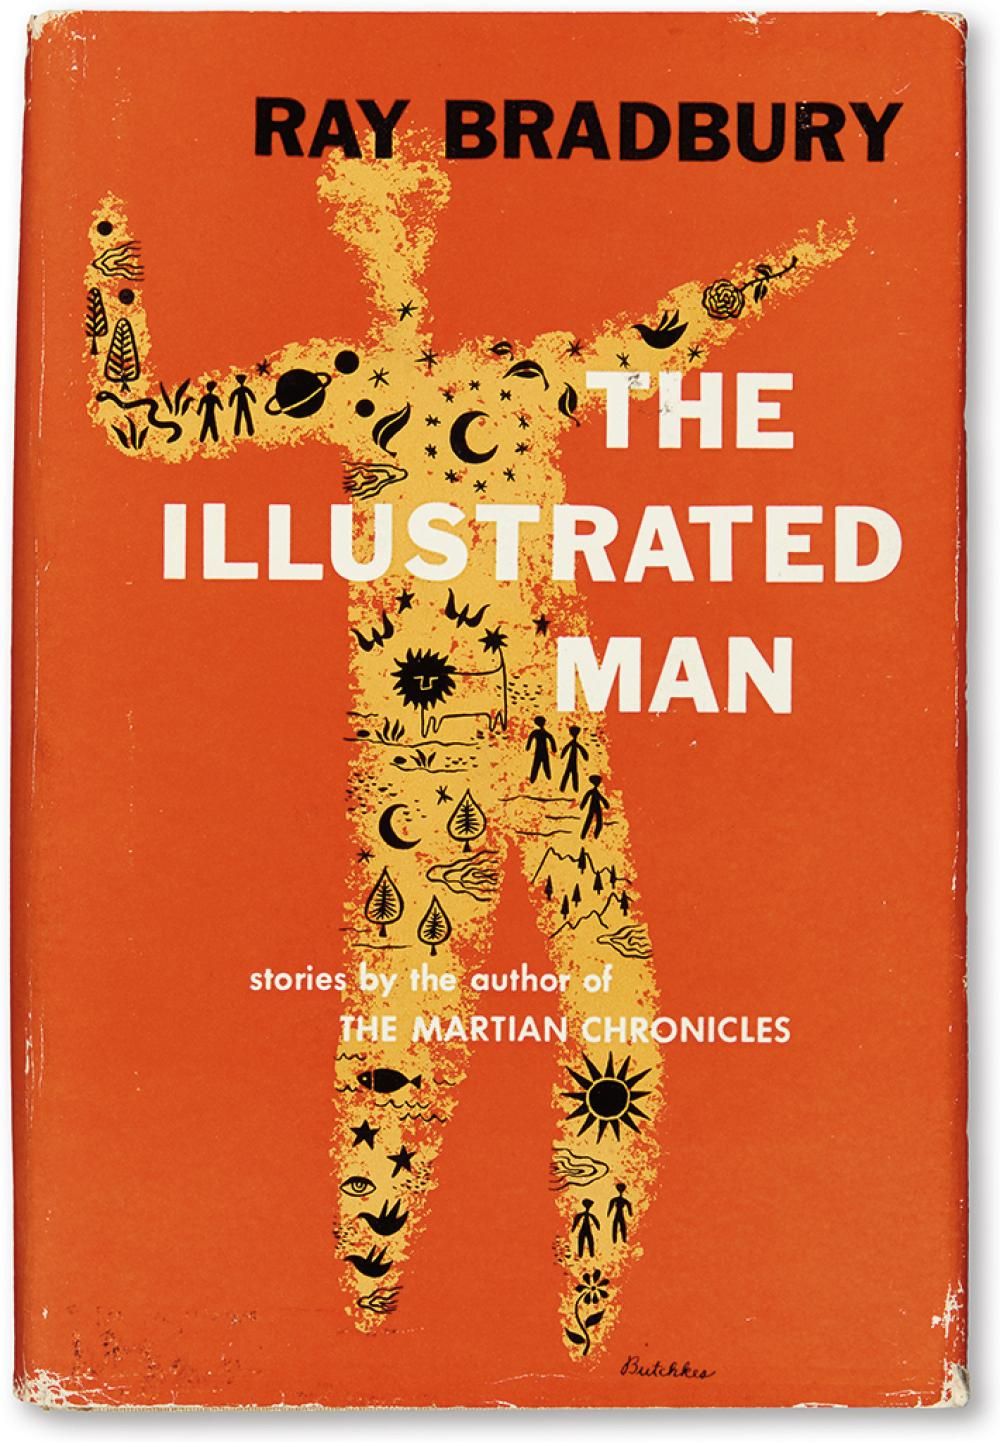 BRADBURY, RAY. The Illustrated Man.